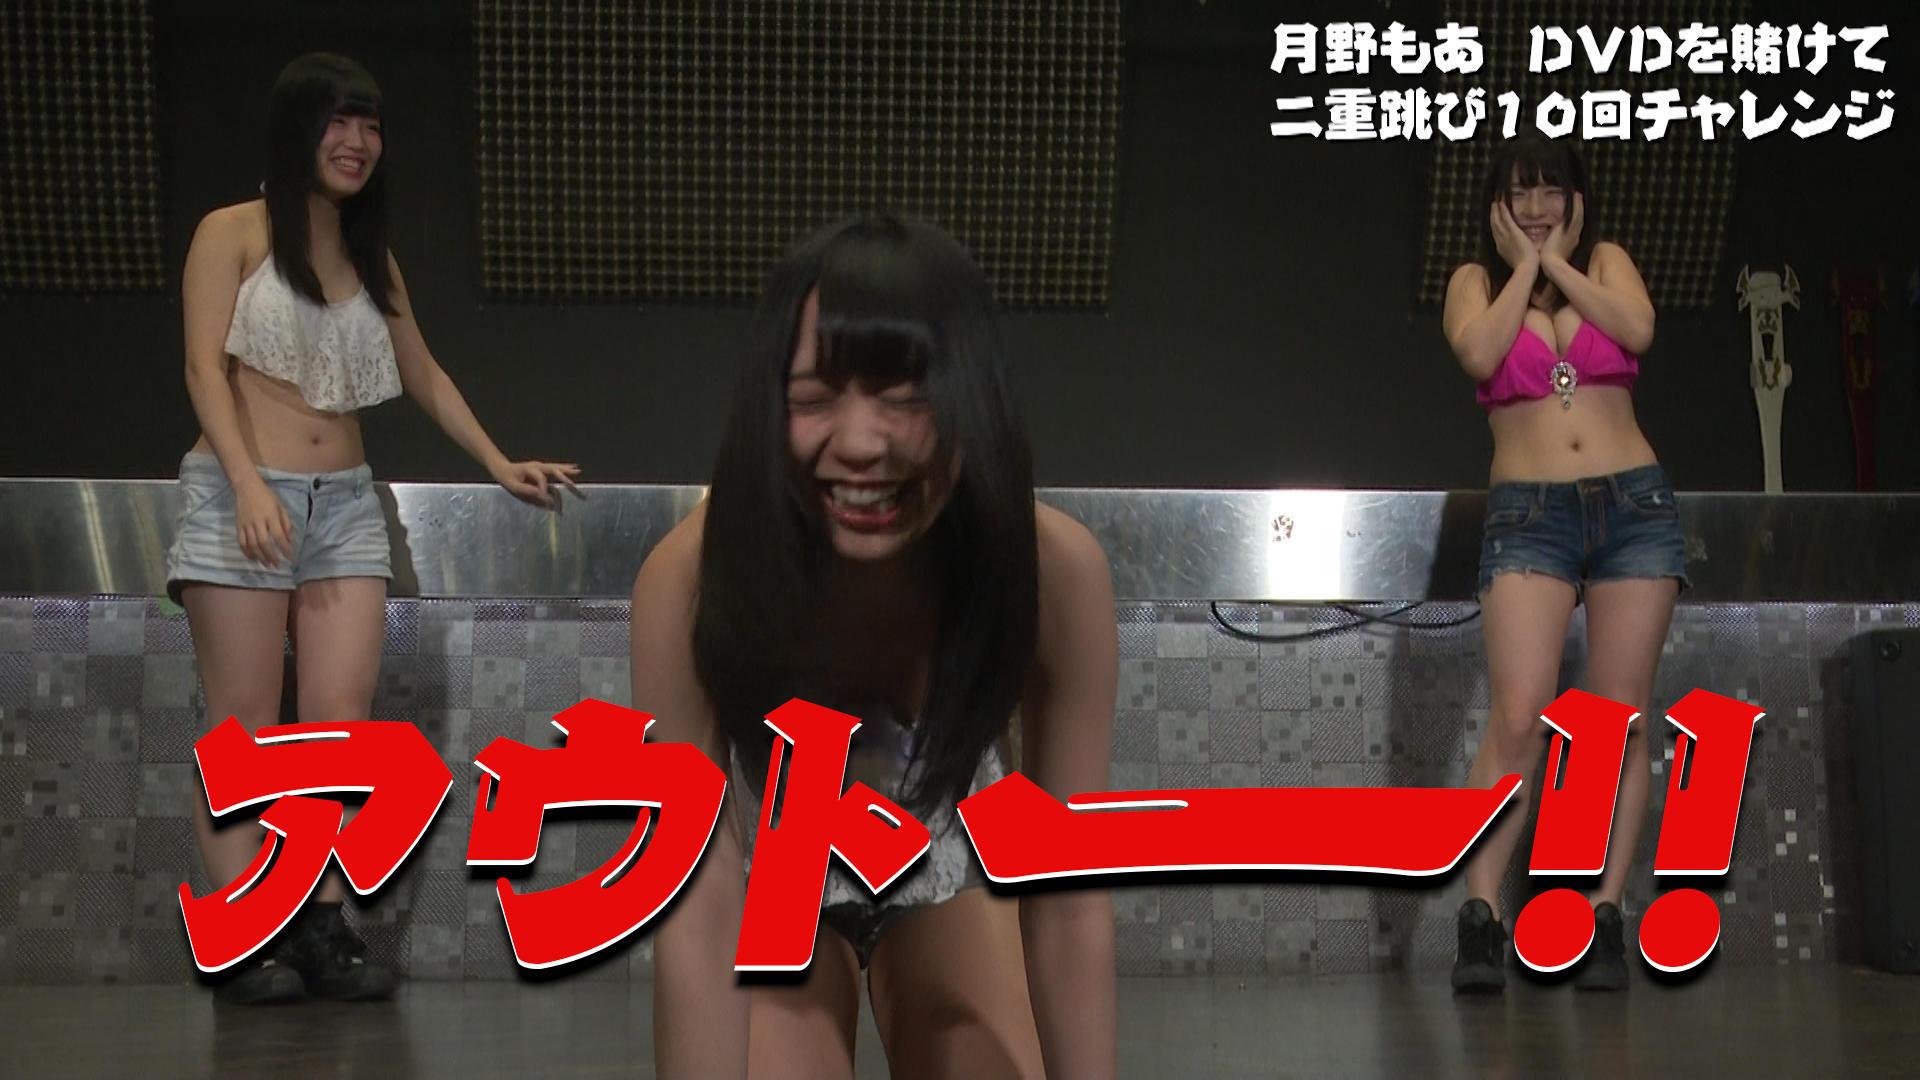 http://news.yoshimoto.co.jp/20180104140038-1e813bb58fc932ad8960ae623eb0b48772aa4344.jpg